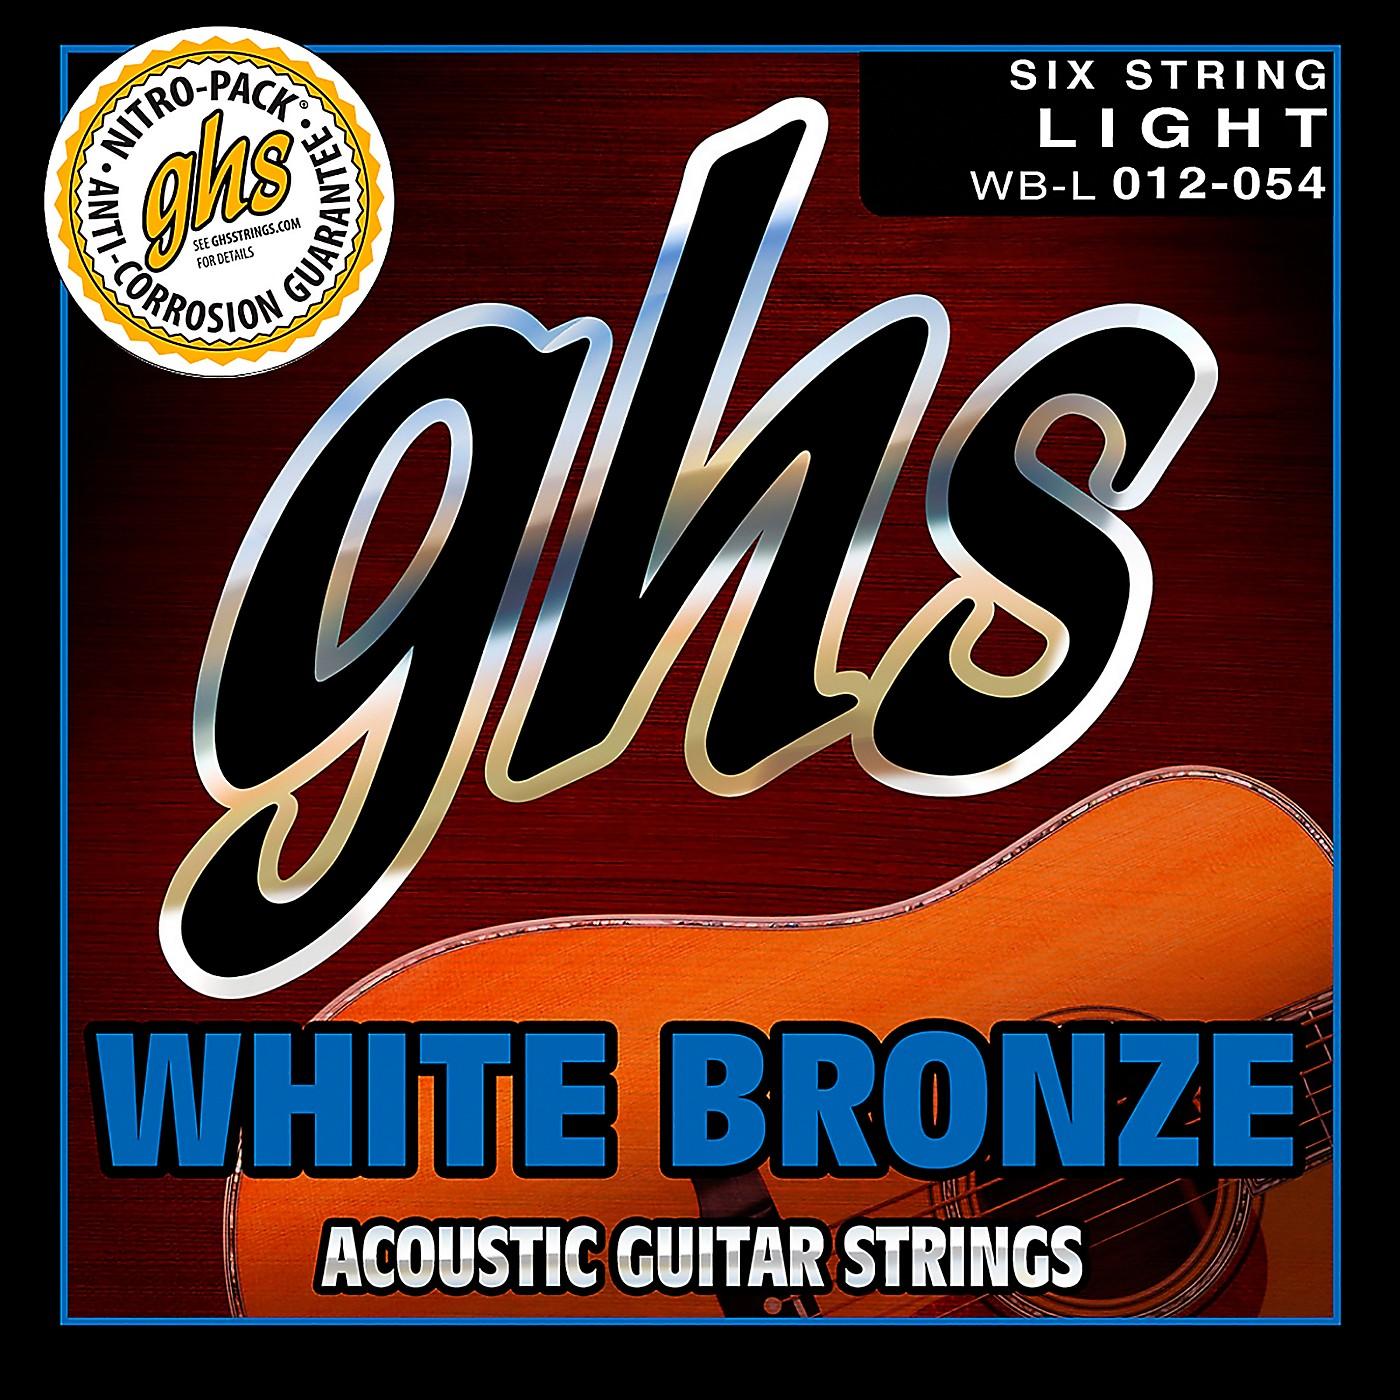 GHS WBL White Bronze Light Acoustic-Electric Guitar Strings thumbnail